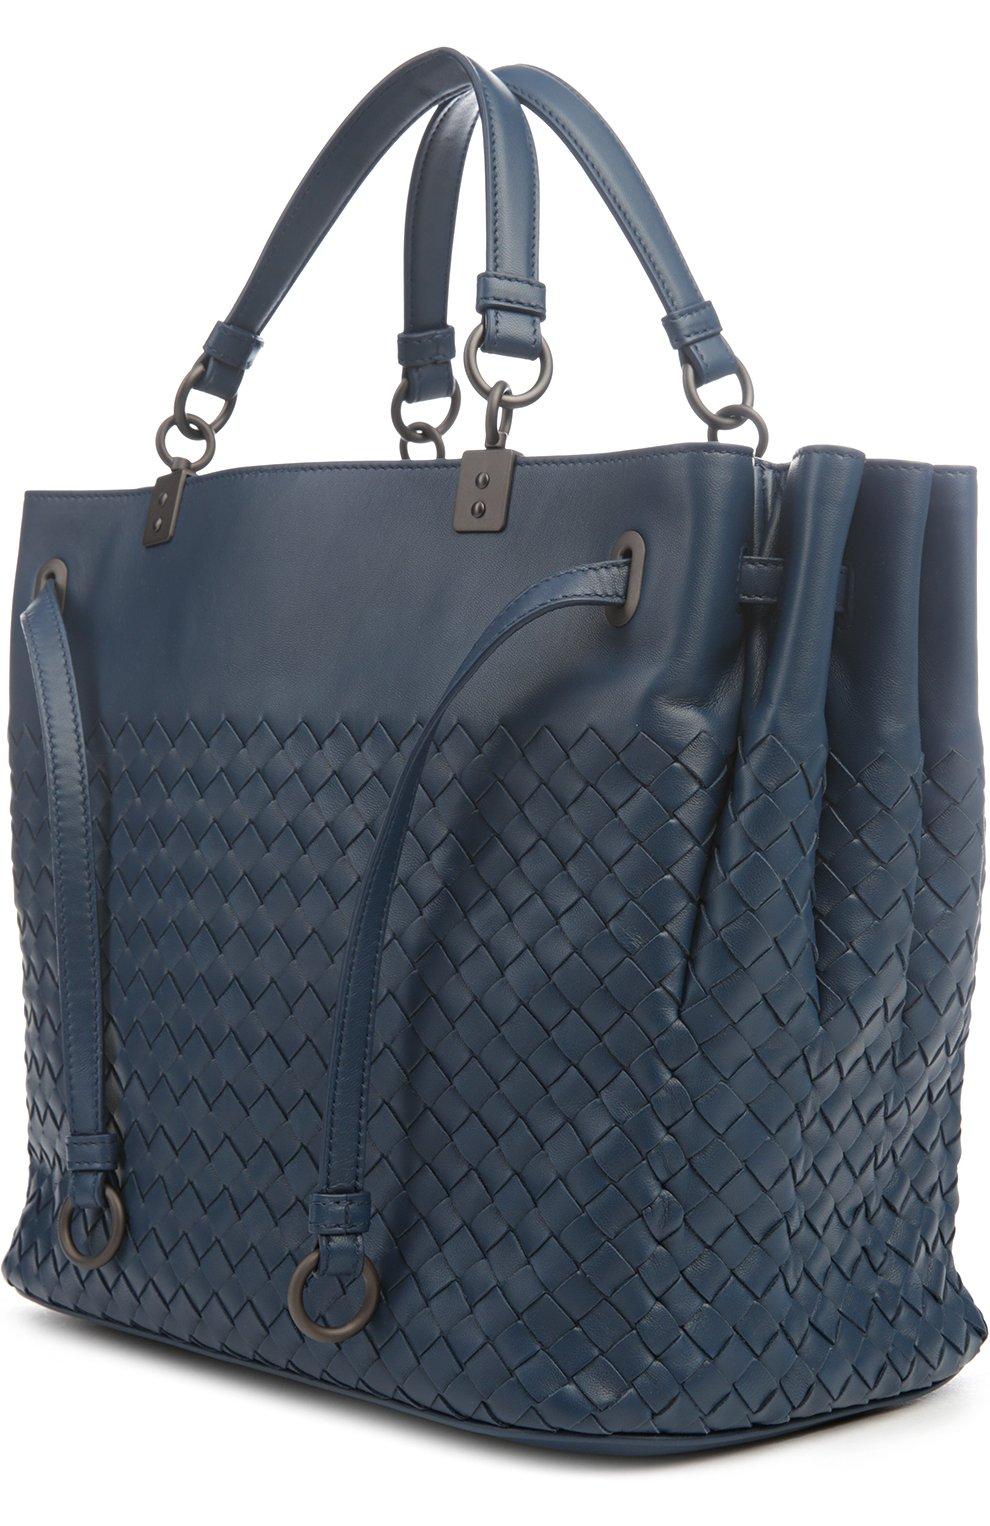 e33c16183889 Кожаная сумка с плетением intrecciato Bottega Veneta синяя цвета | Фото №3